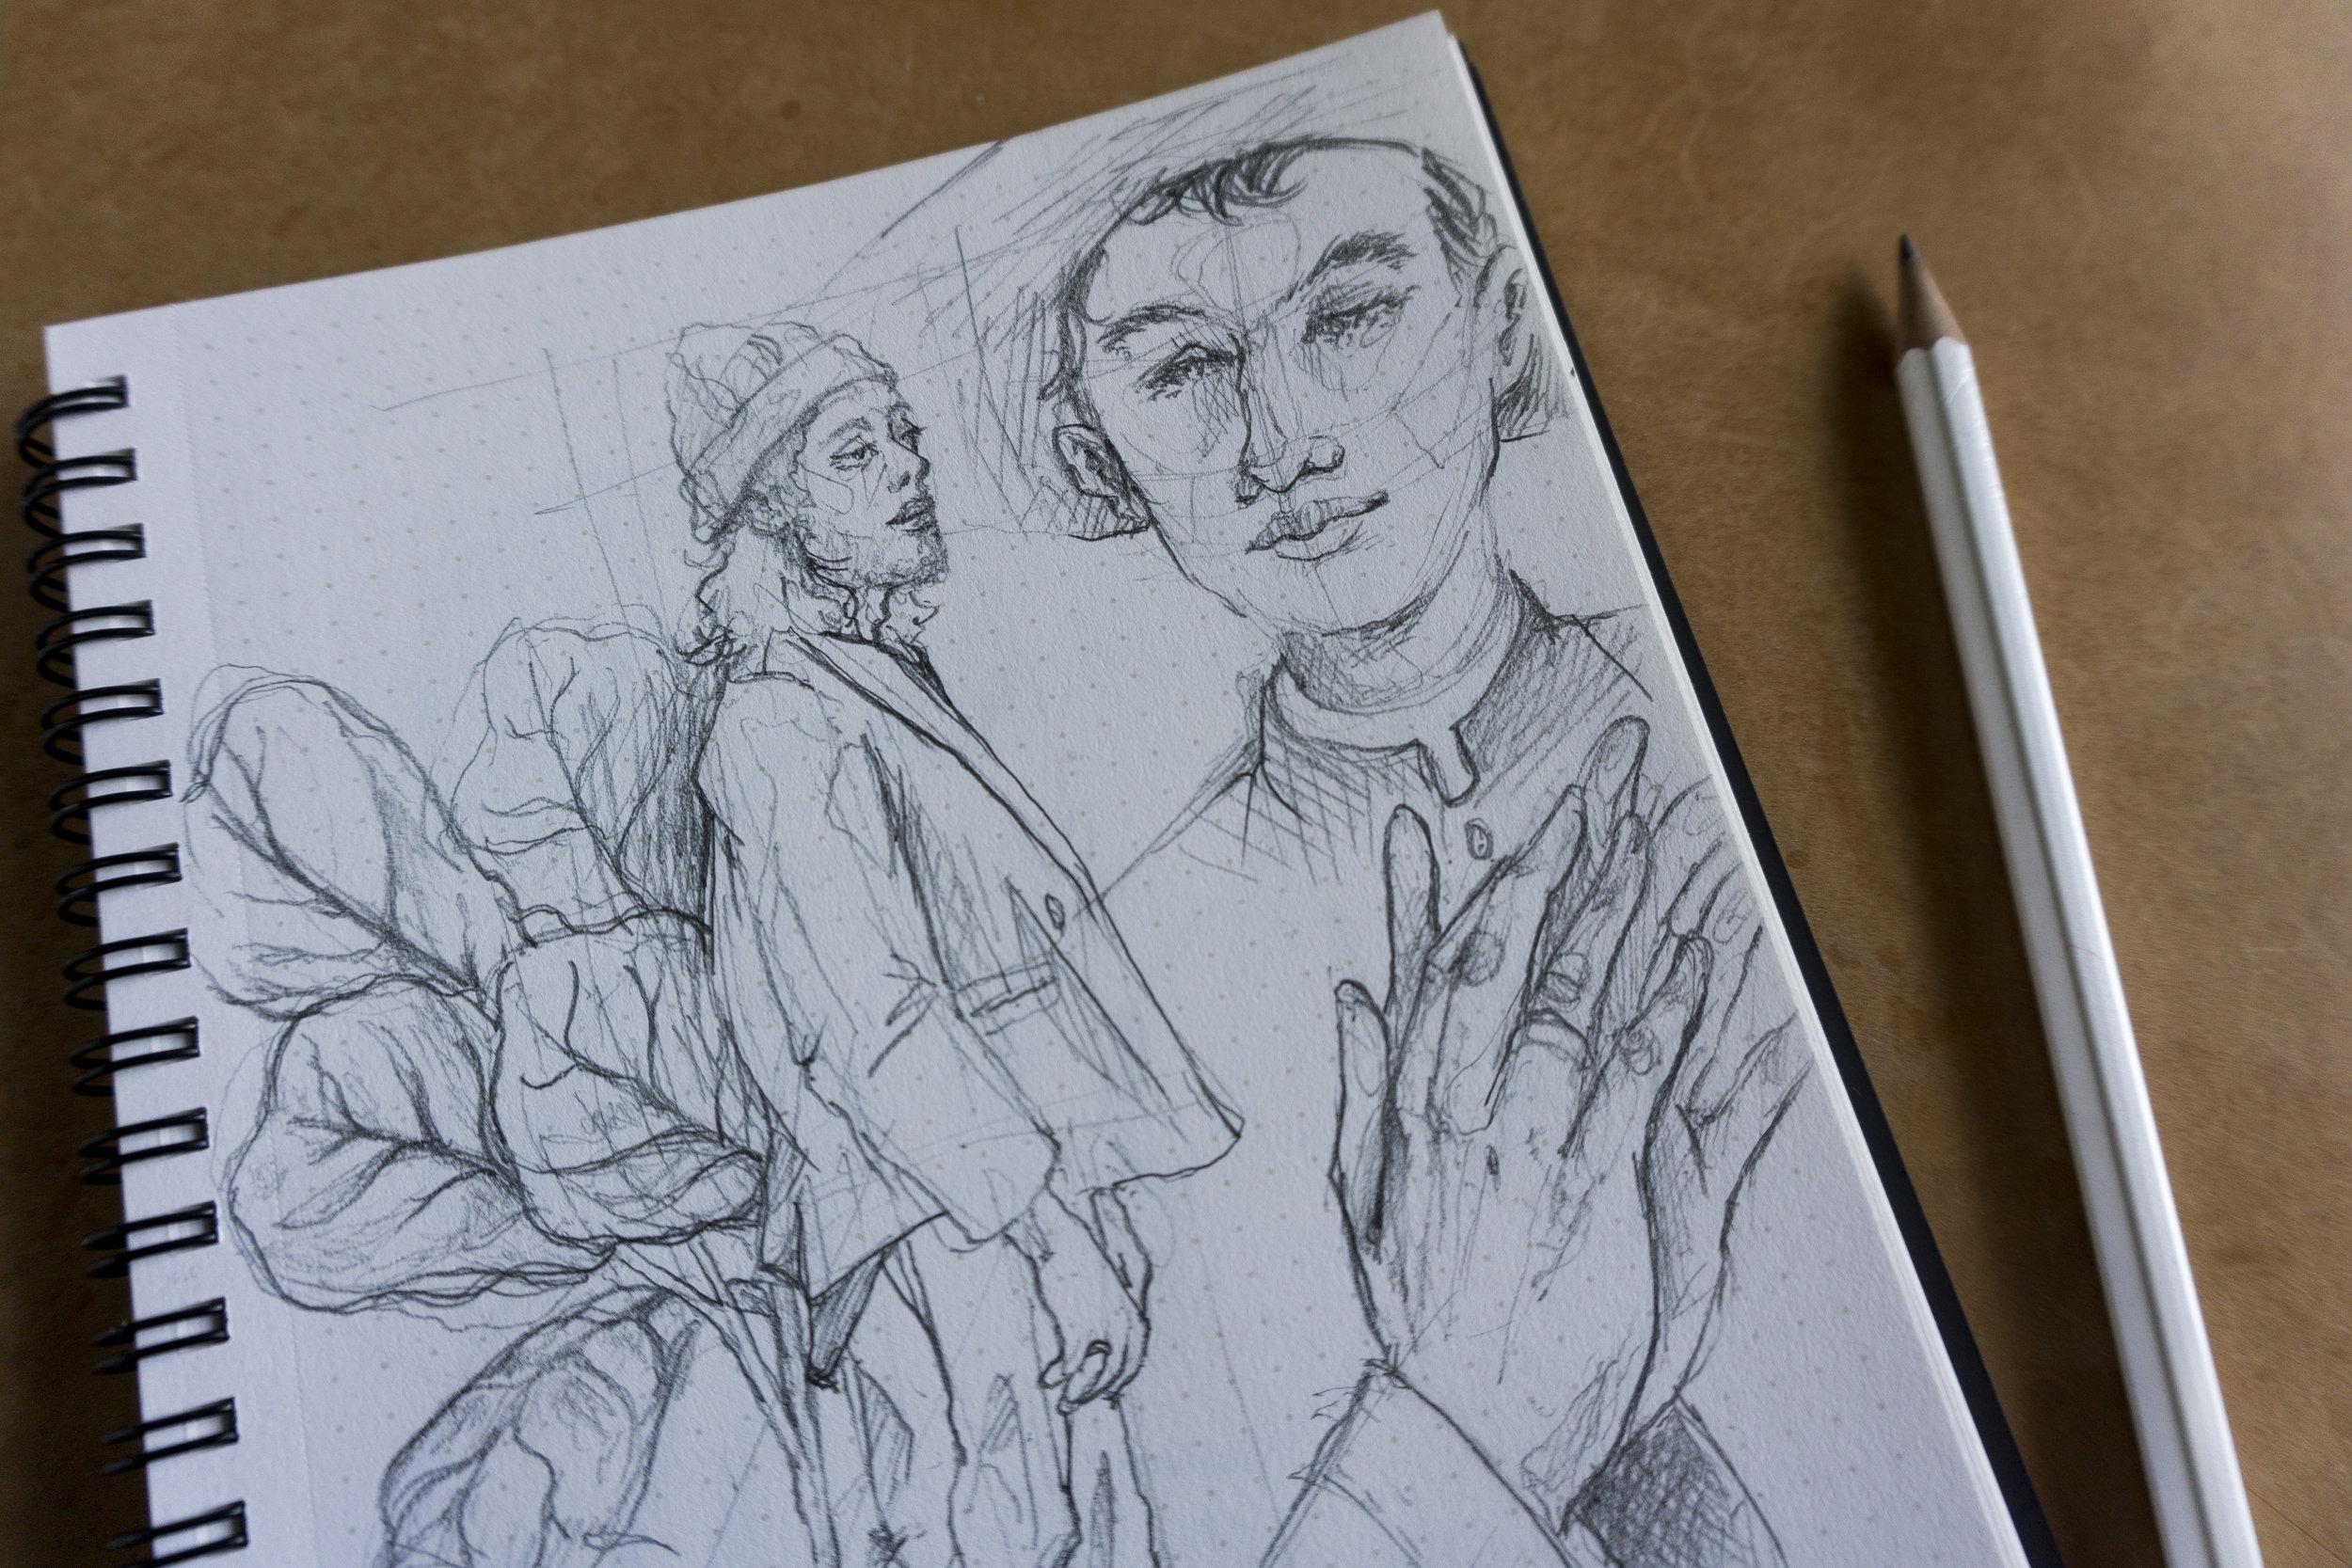 DotGrid-JT-drawing.jpg